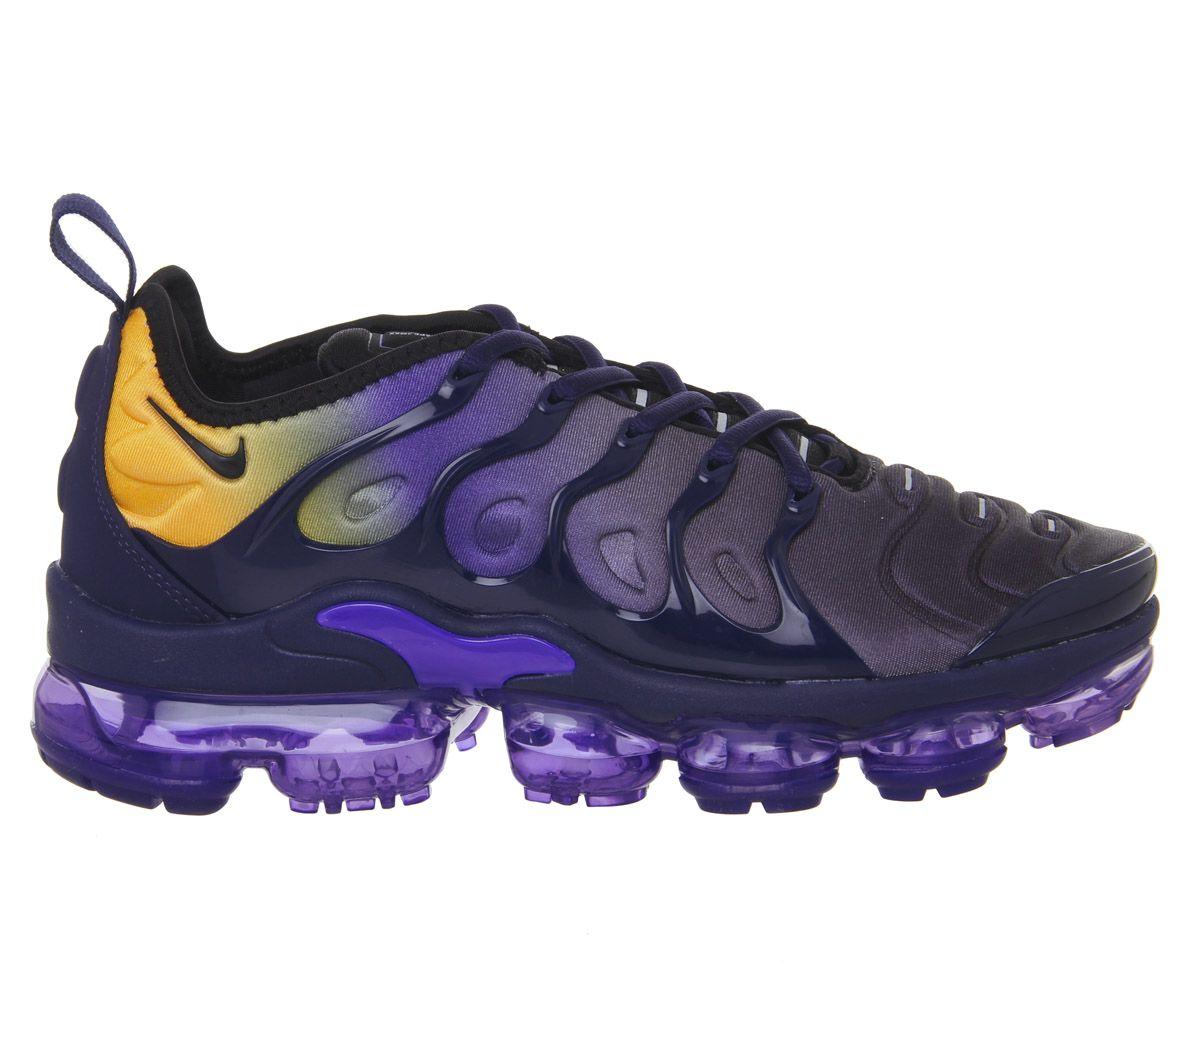 9199e4b7590 Nike Vapormax Air Vapormax Plus Trainers Persian Violet Black ...